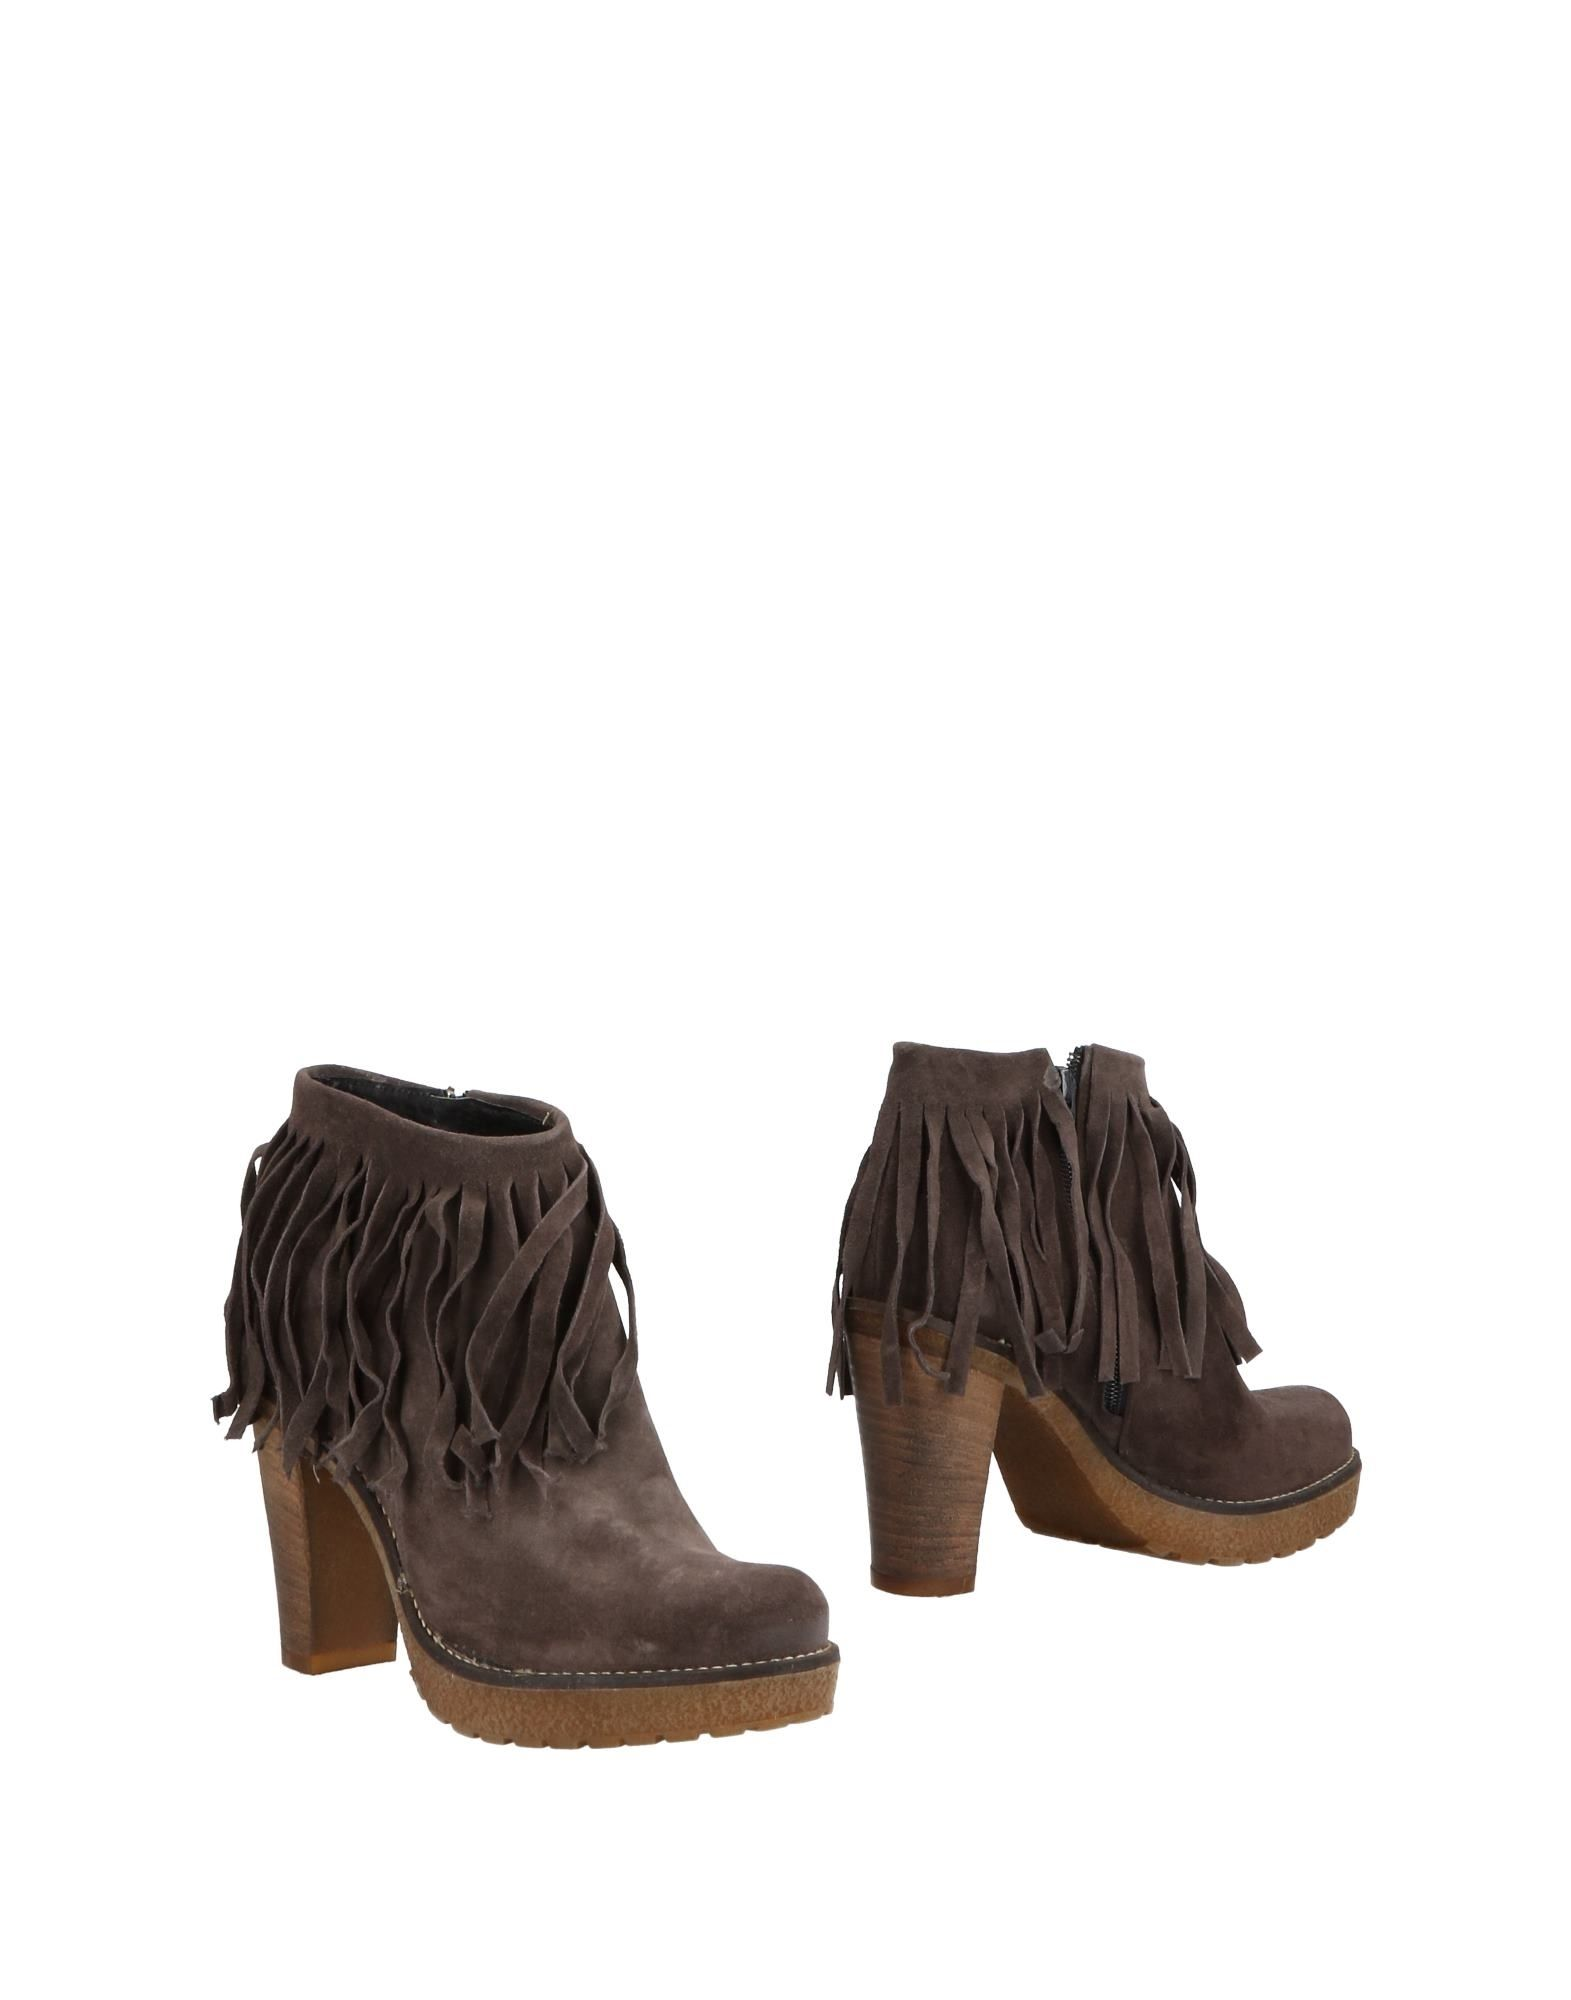 GINO SENTELL® Полусапоги и высокие ботинки gino sentell® полусапоги и высокие ботинки